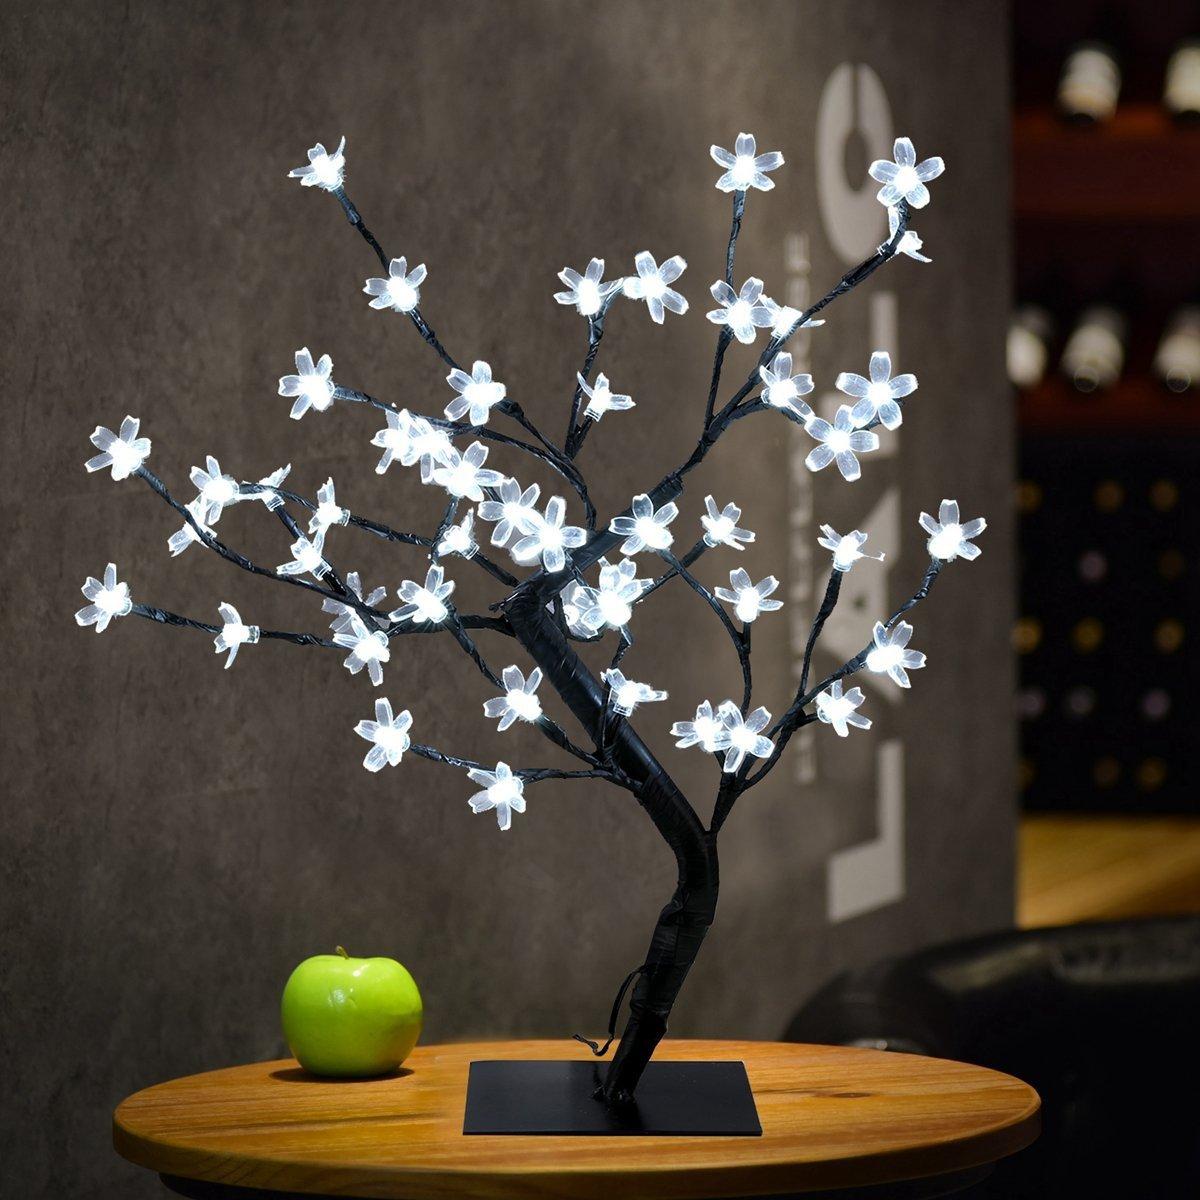 Freebily Shapeable LEDs Flower Blossom Bonsai Tree Christmas Replacement Desk Light for Home Windowsill Festival Indoor Outdoor Decor White One Size